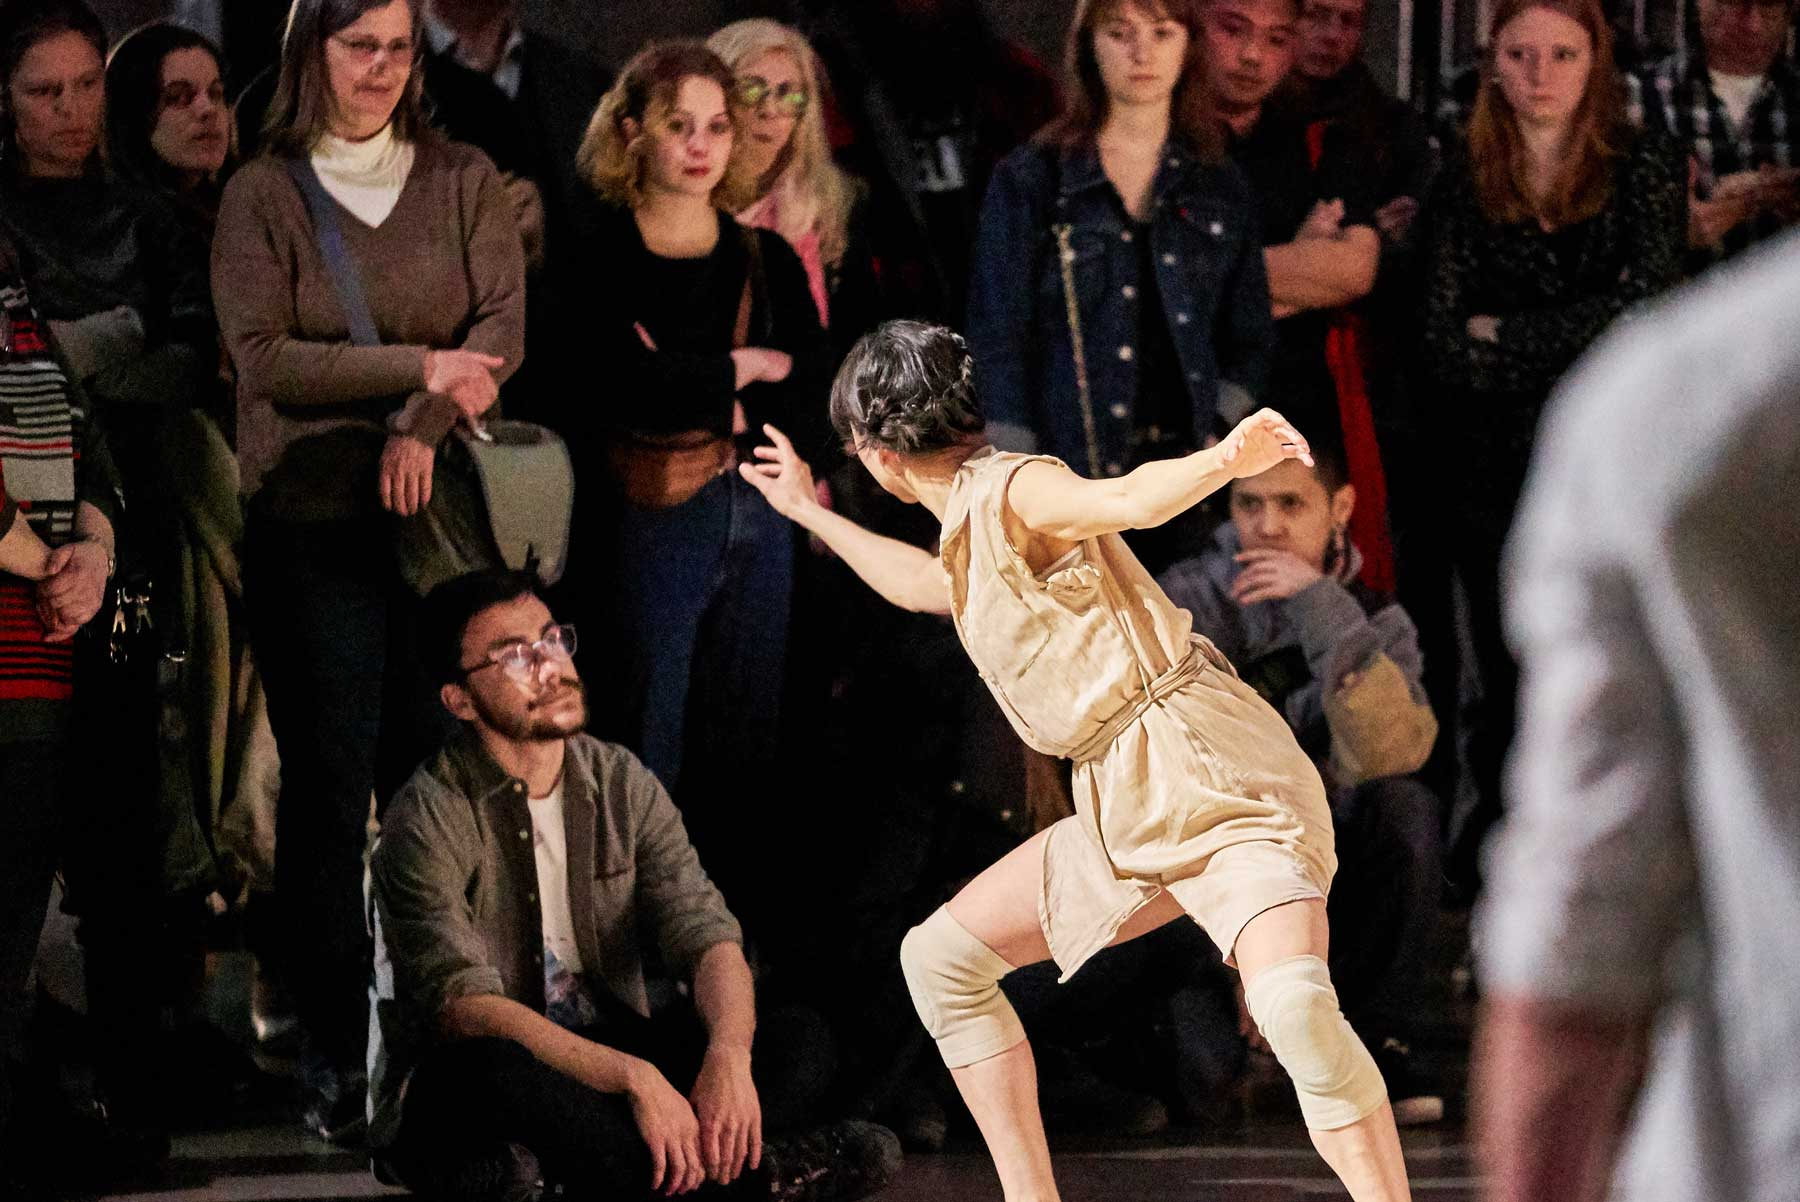 mardi-culturel-td-danse-danse-kyra-jean-green-trip-the-light-fantastic-5.jpg